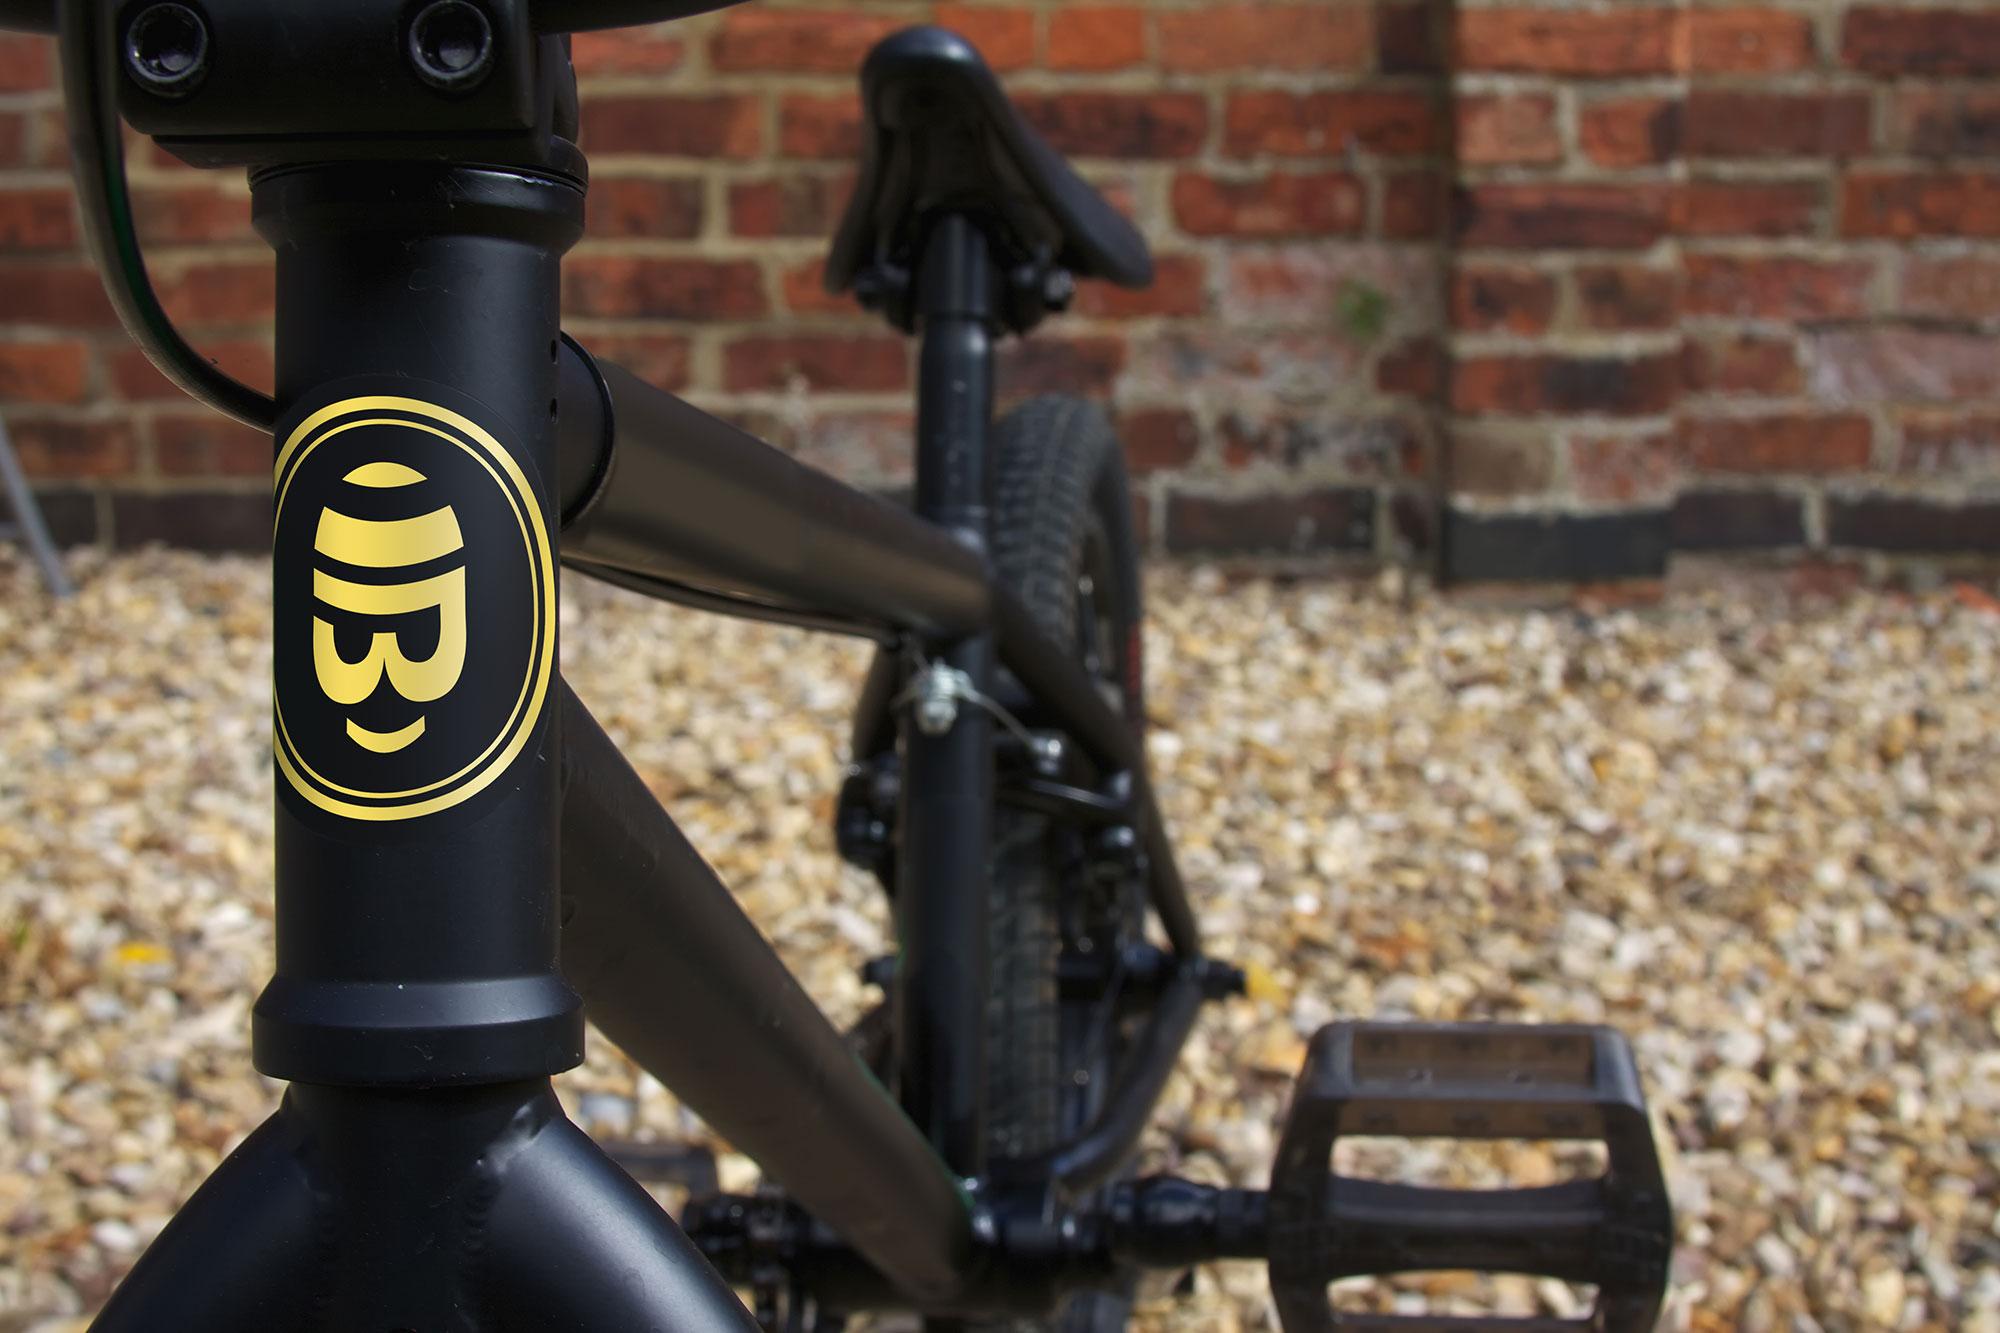 Bradley Wiggins bike stickers - brand identity design by Martin Sully